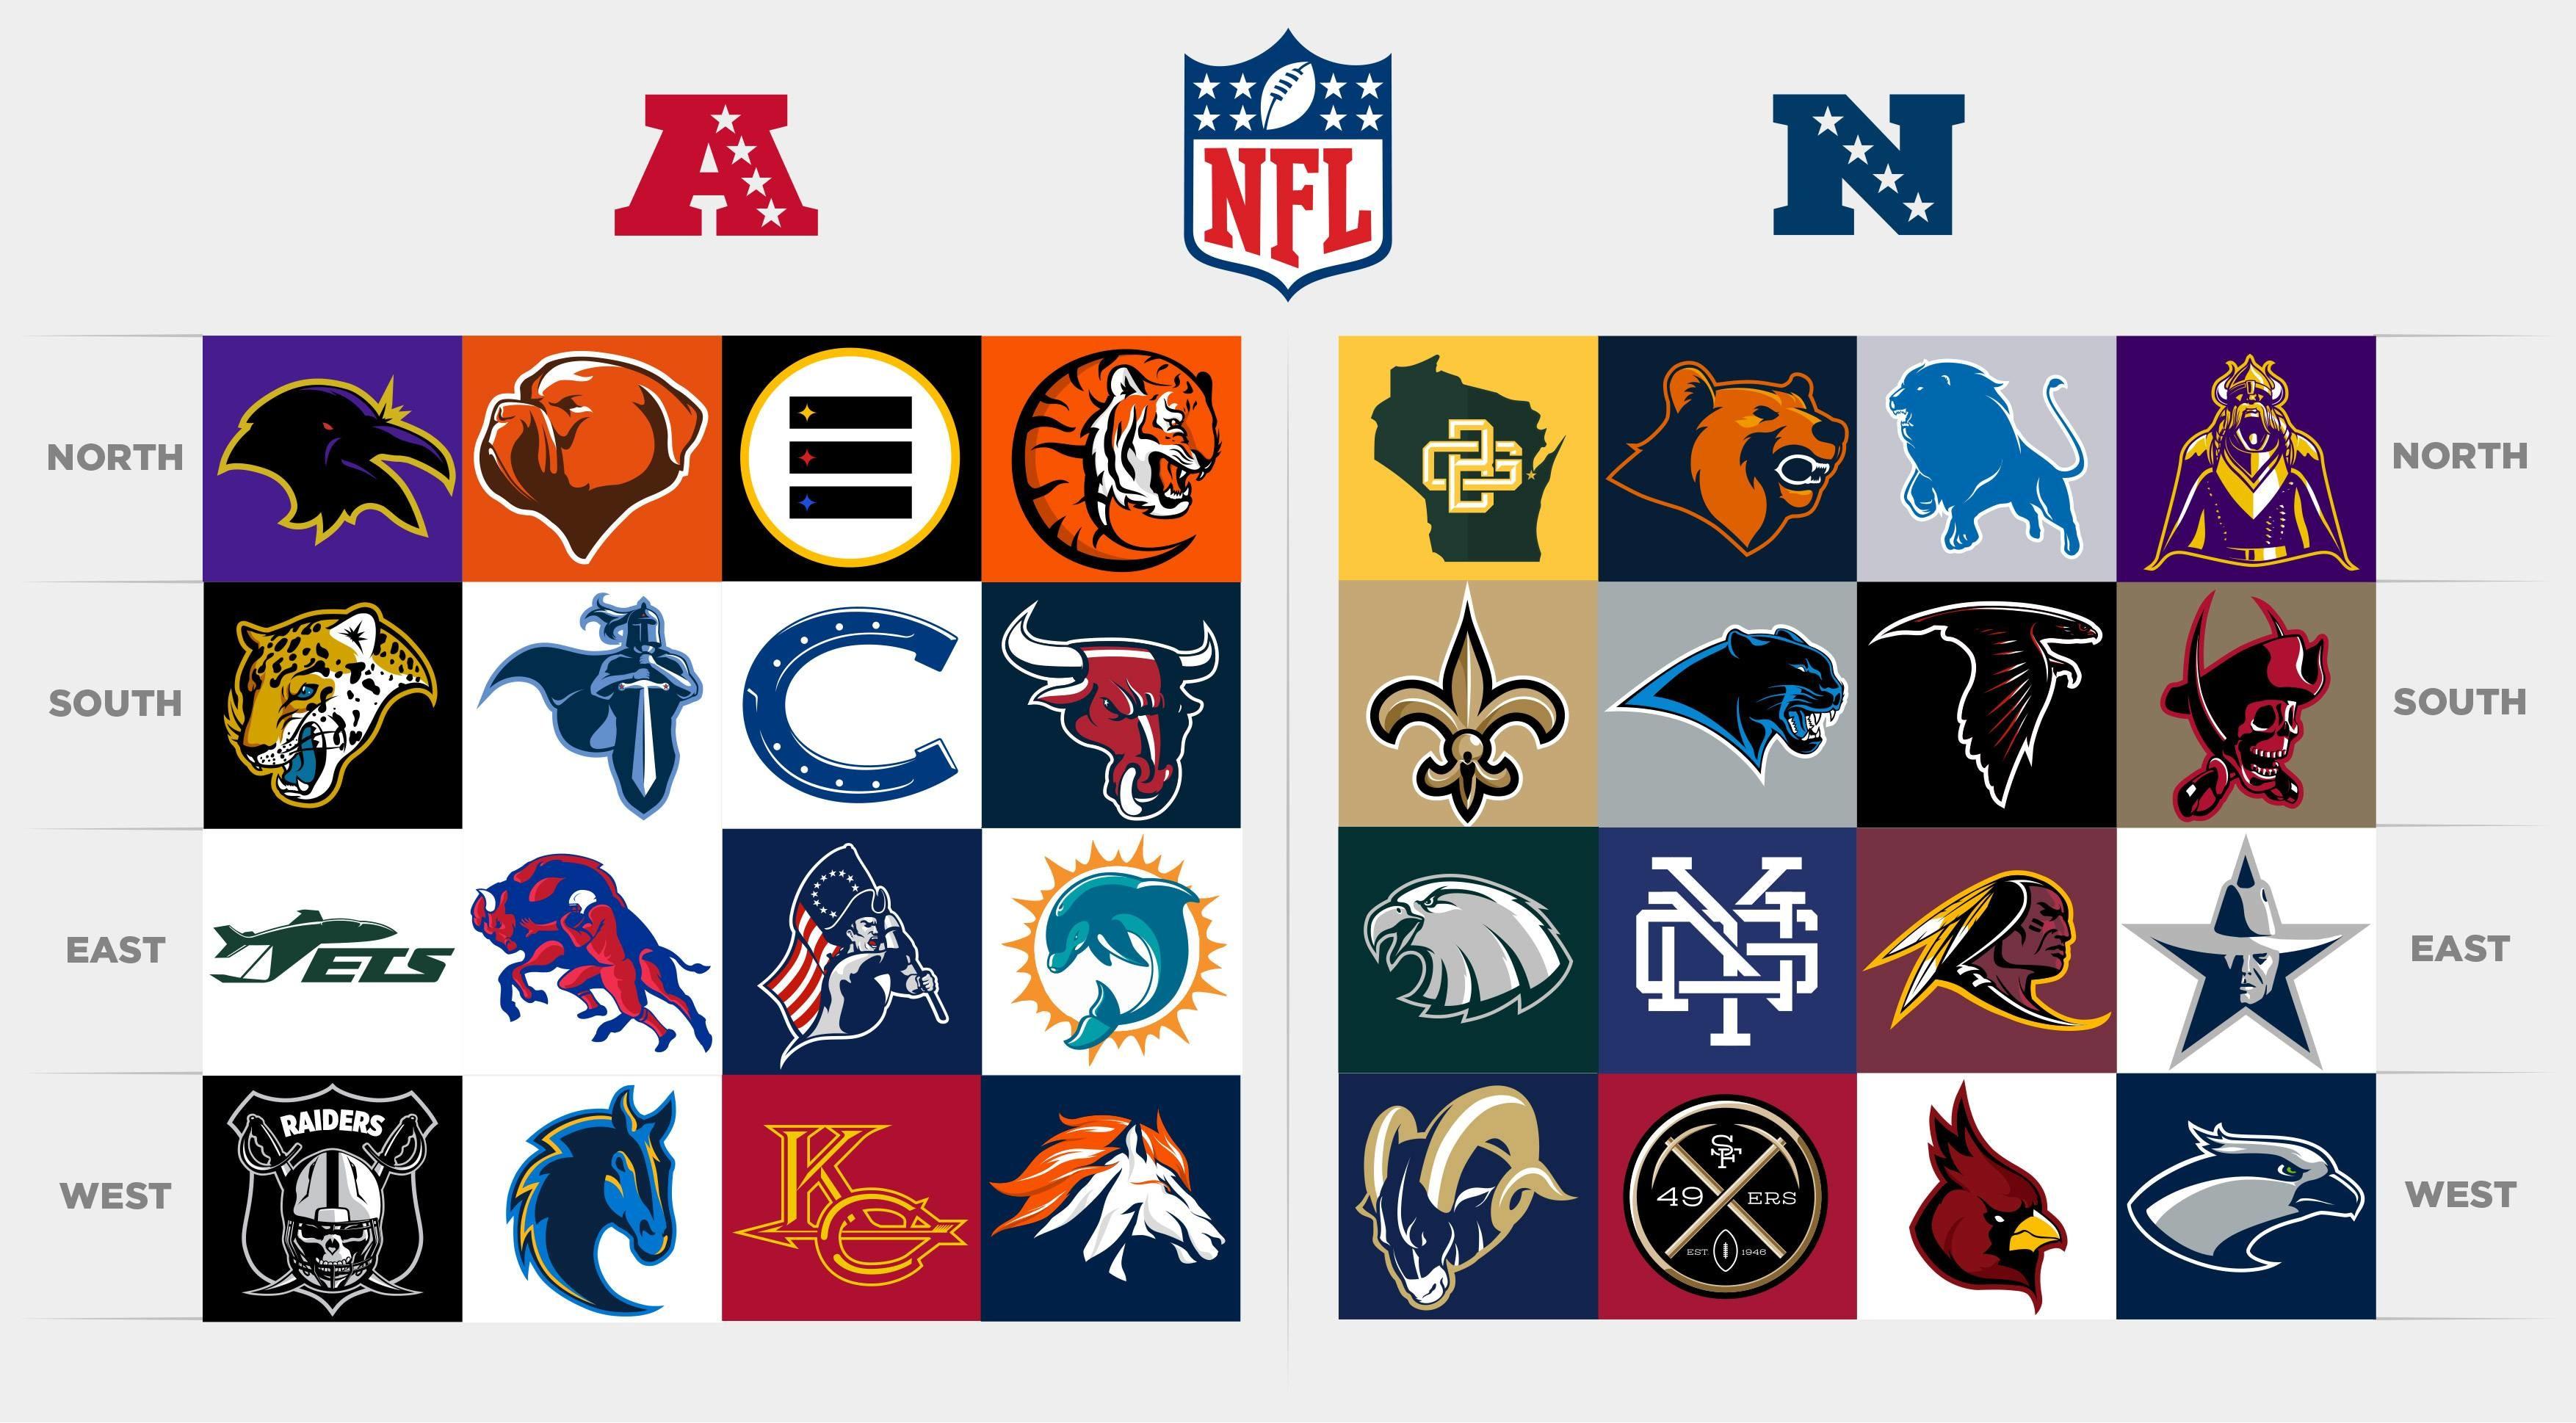 NFL Logo Teams wallpaper HD 2016 in Football   Wallpapers HD